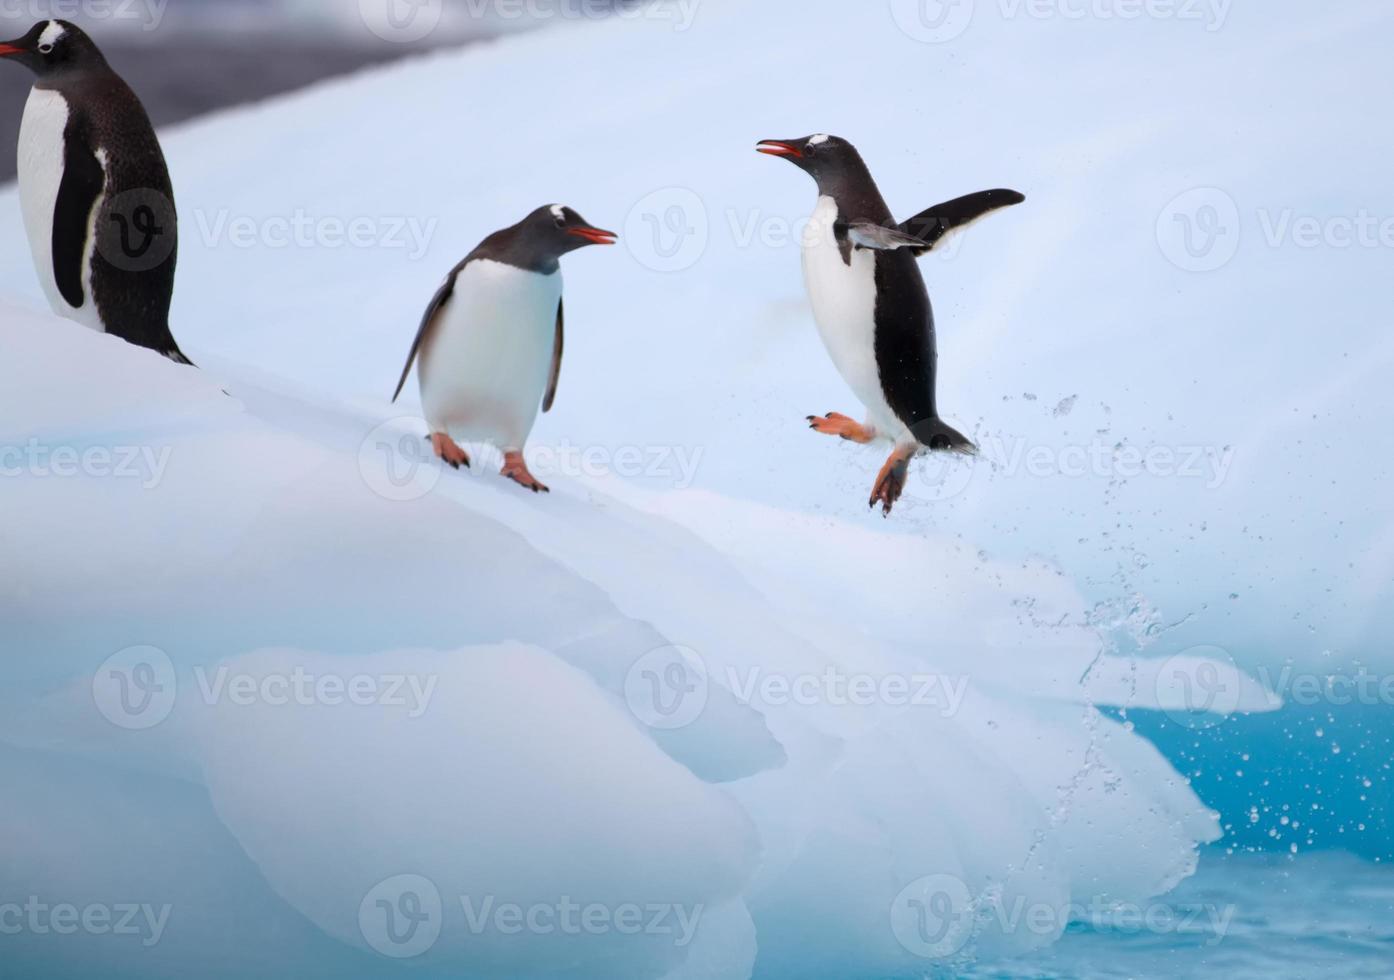 Jumping Gentoo Penguins on Iceberg photo